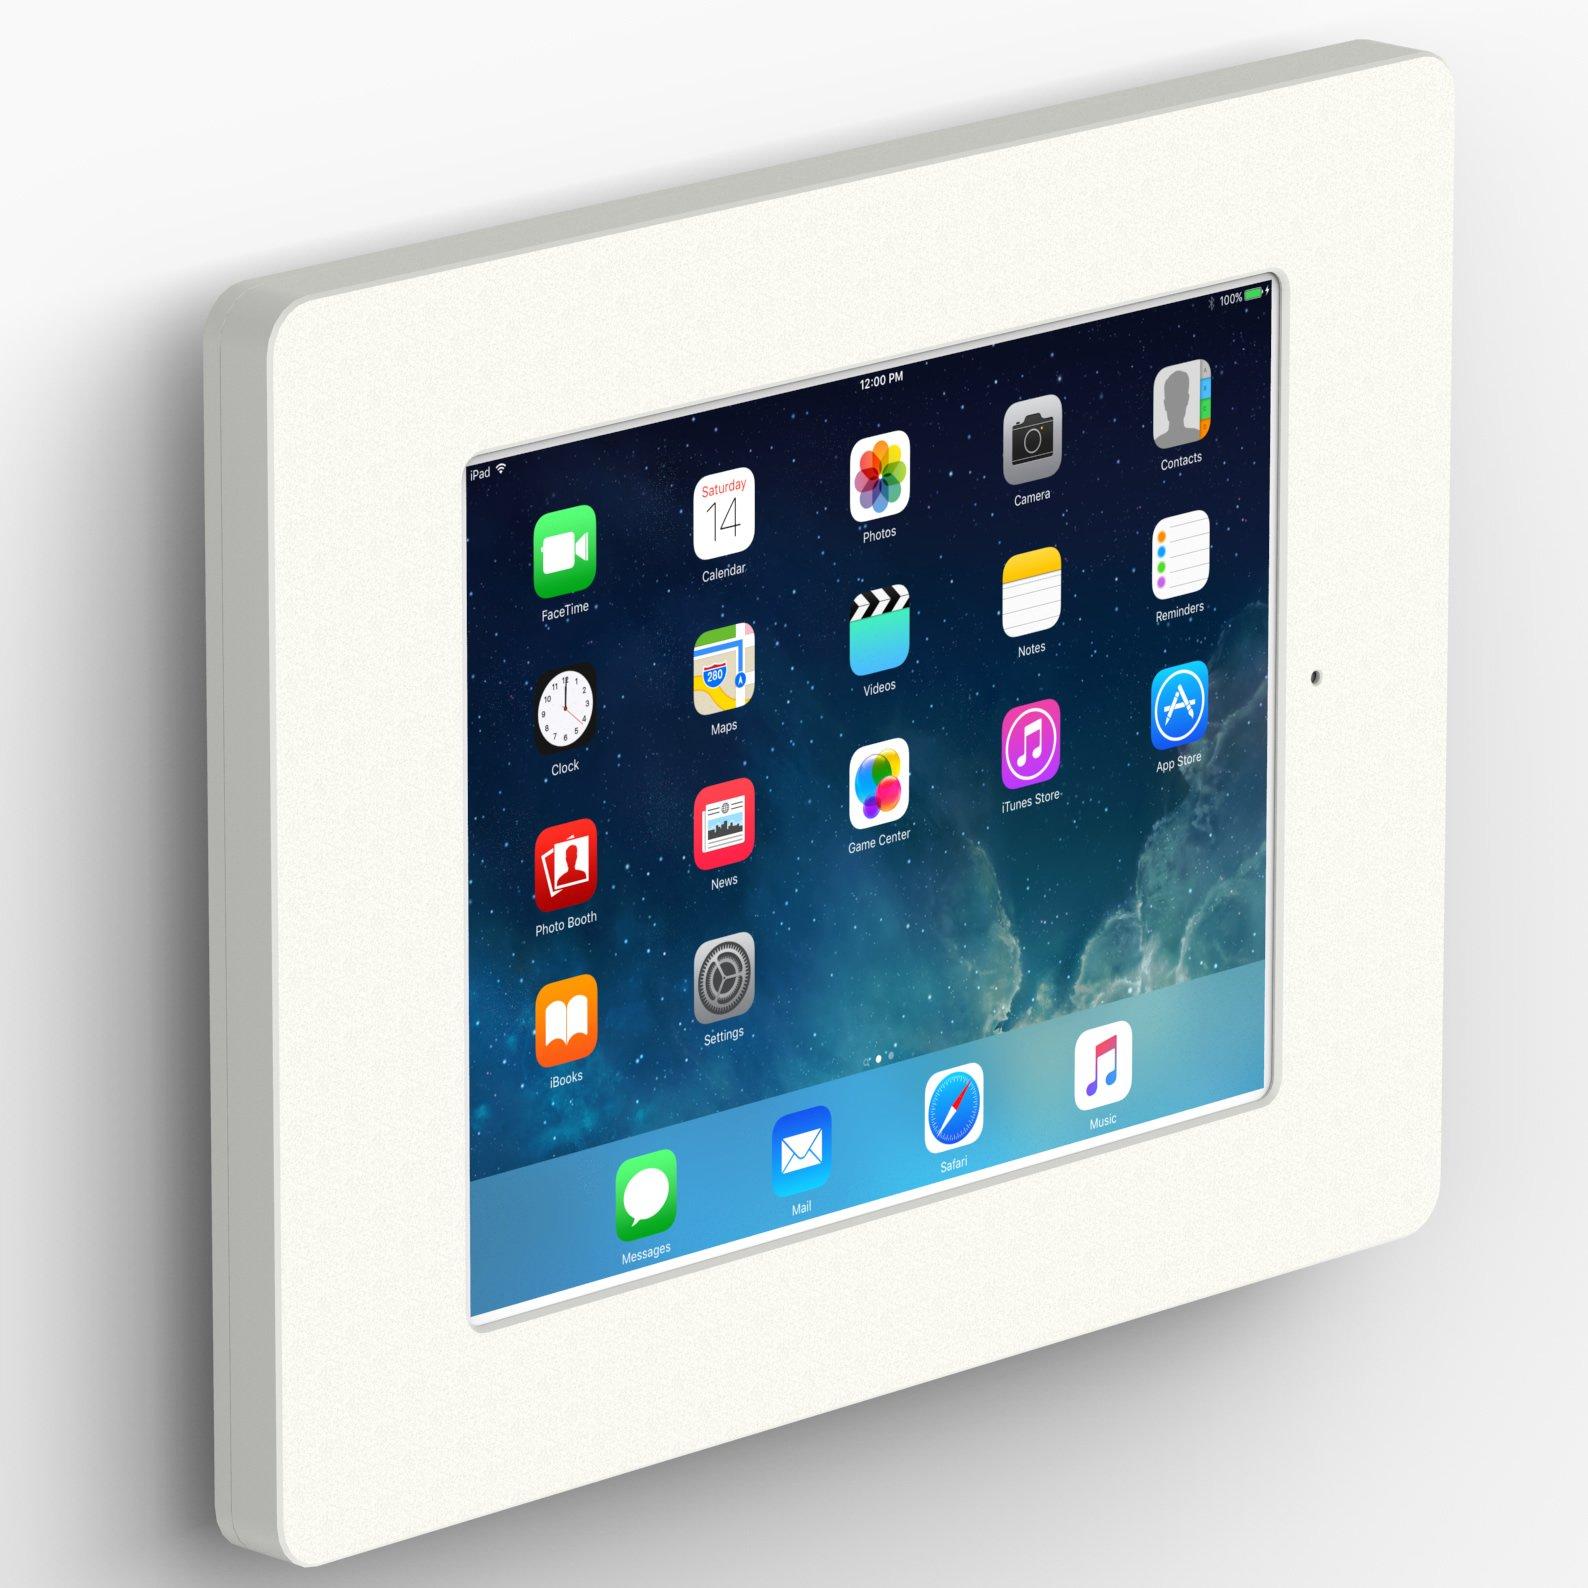 iPad (5th Gen) 9.7/Pro, Air 1/2 White Home Button Covered Fixed Slim VESA Wall Mount [Bundle] by VidaBox Kiosks (Image #1)